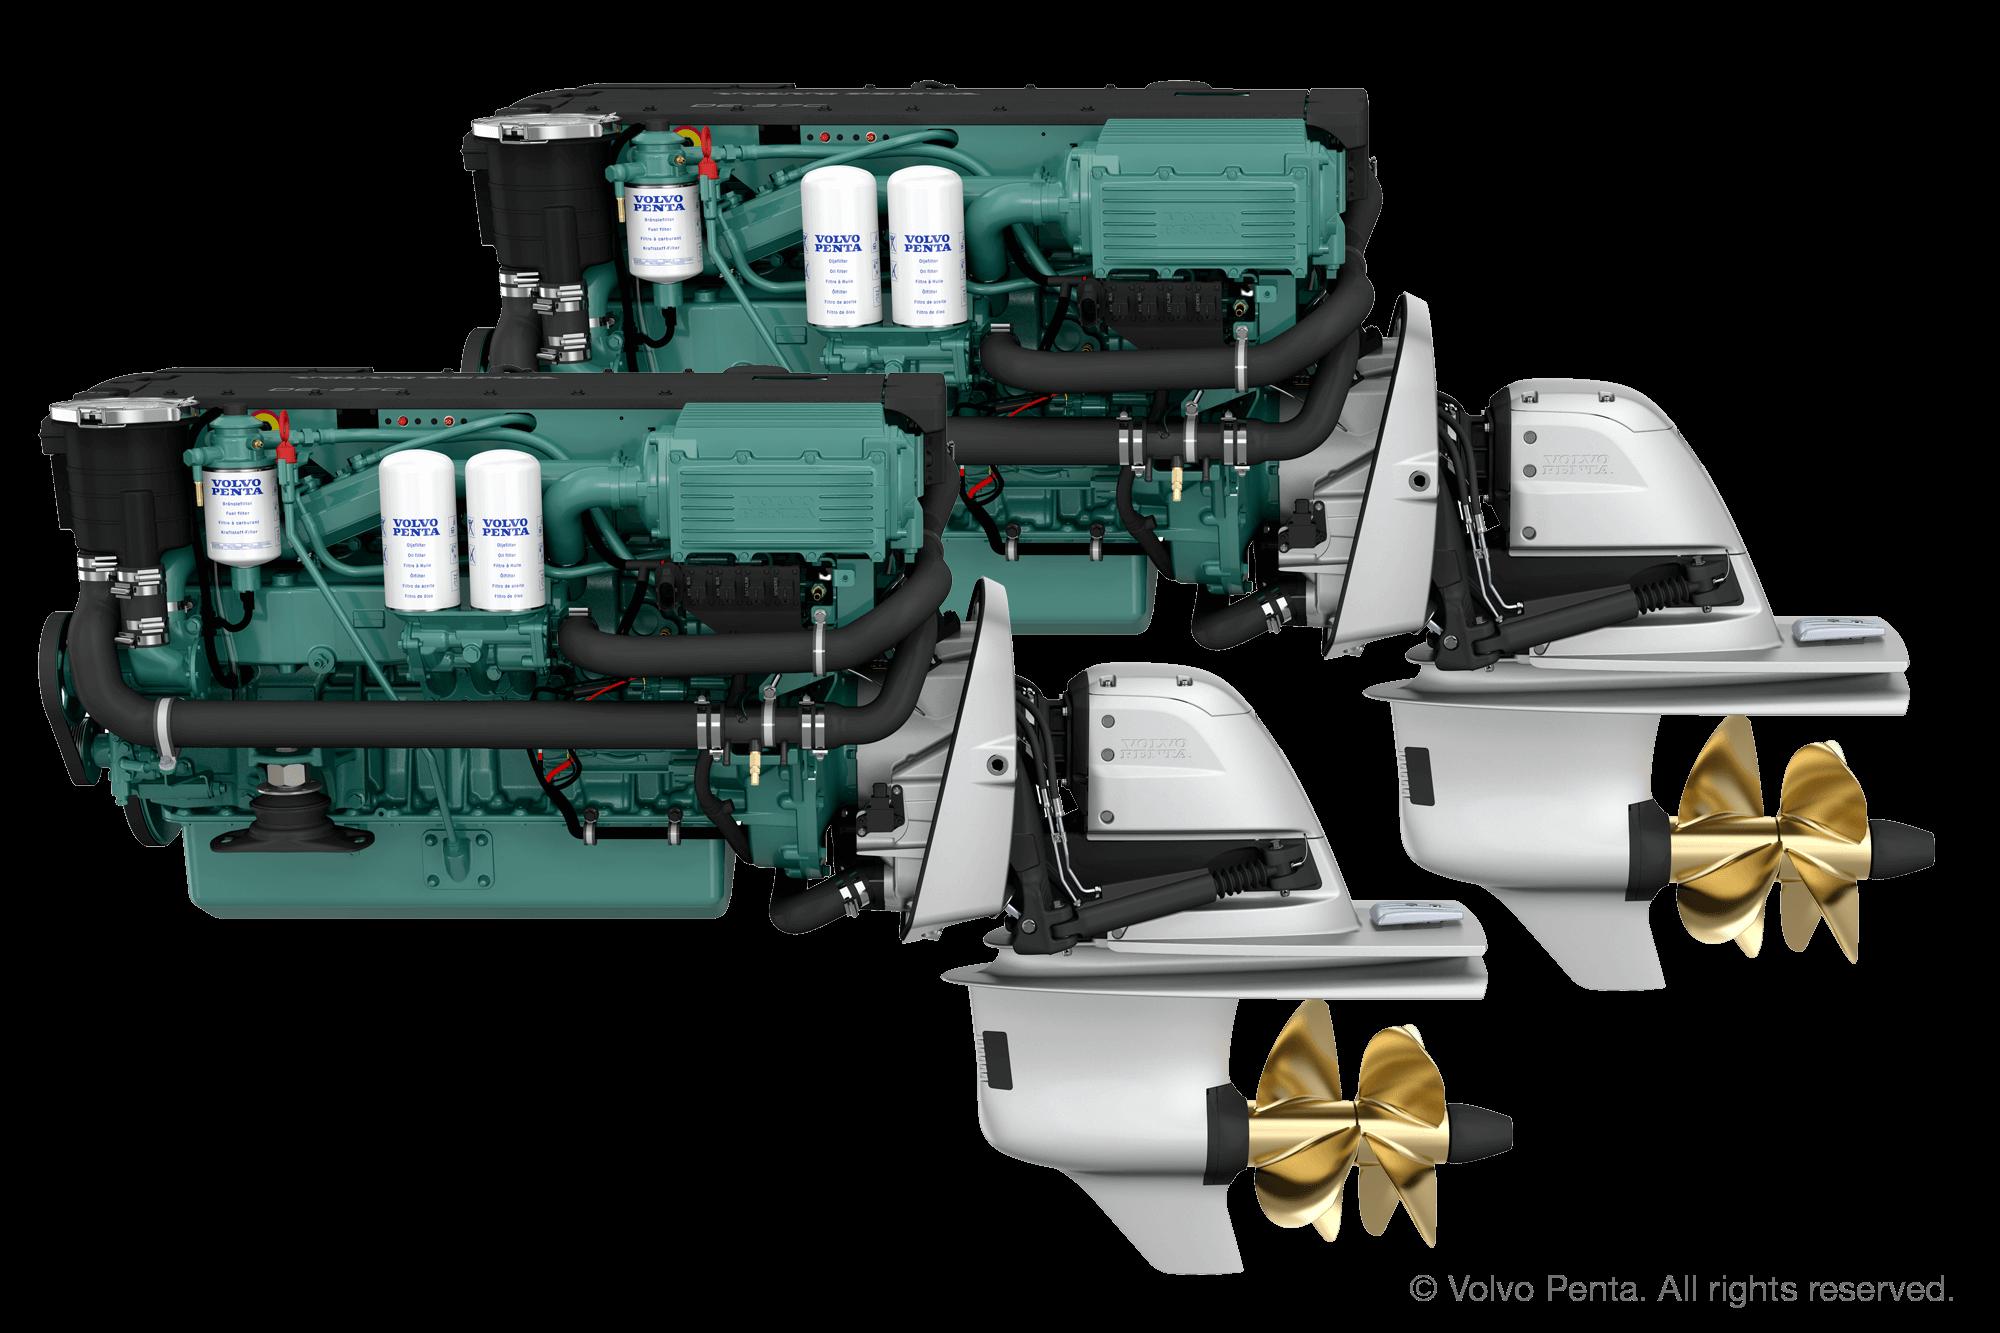 2 Volvo Penta D6-380 (380 PS) - DUOPROP STERN DRIVE mit Propeller G4